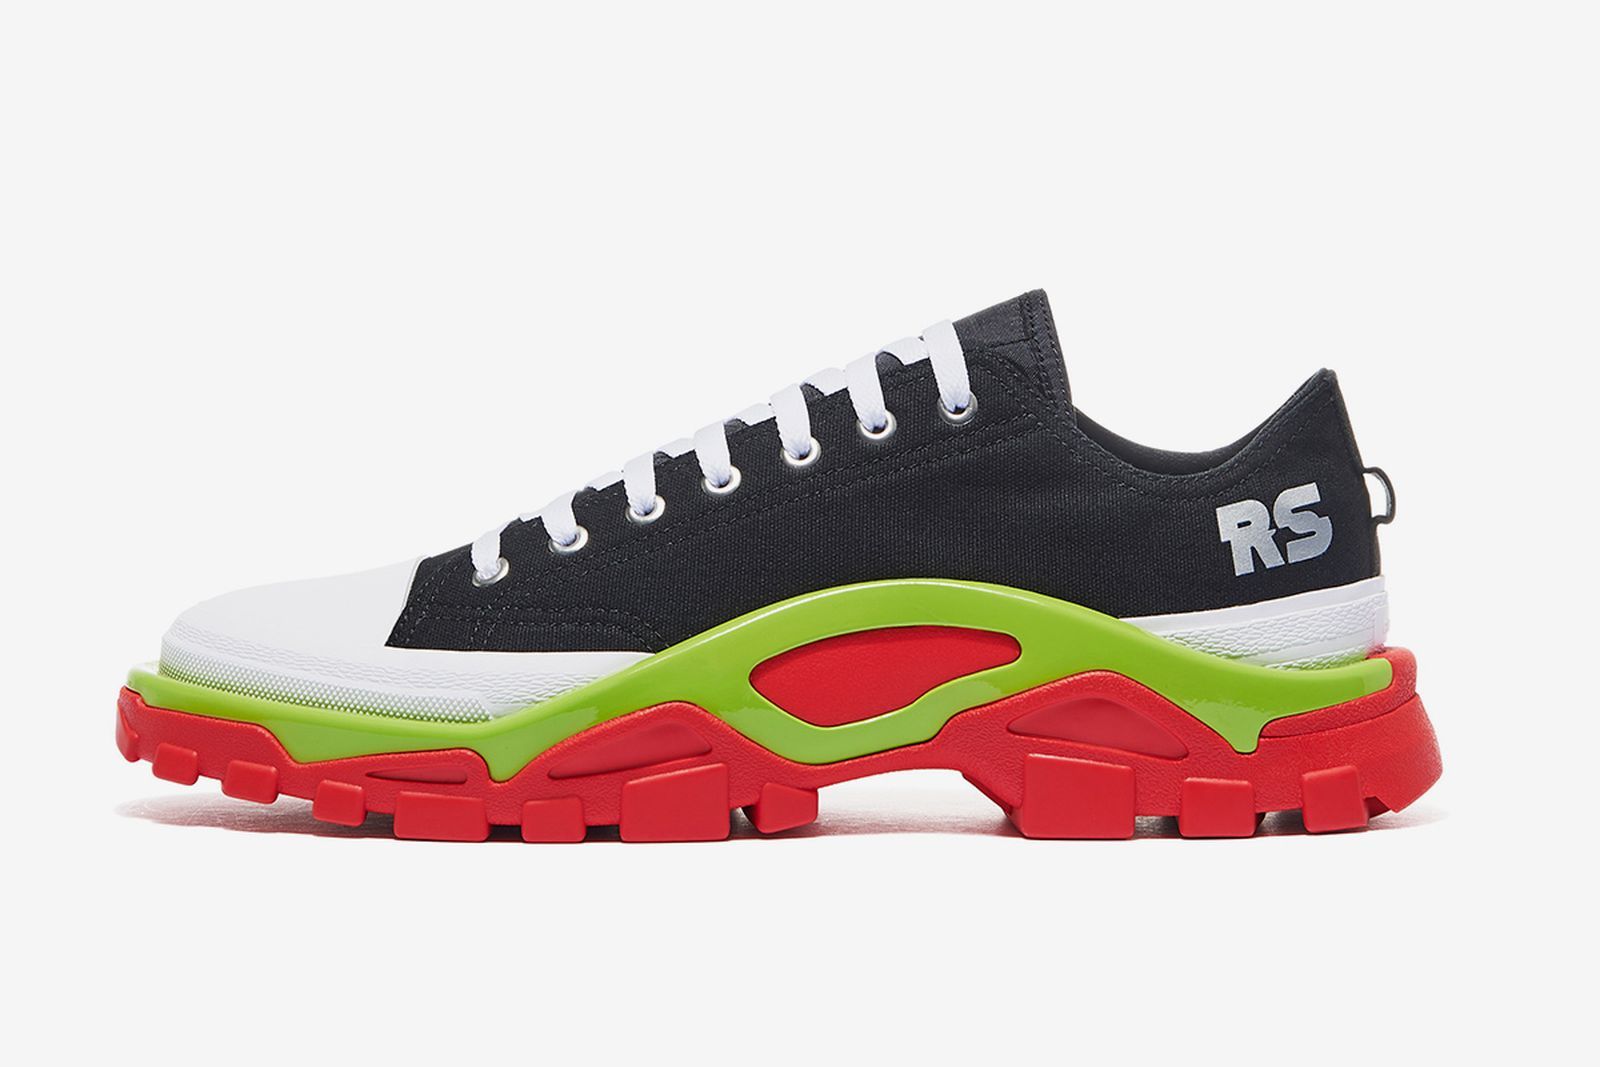 raf simons adidas rs replicant ozweego release date price adidas Originals adidas by raf simons